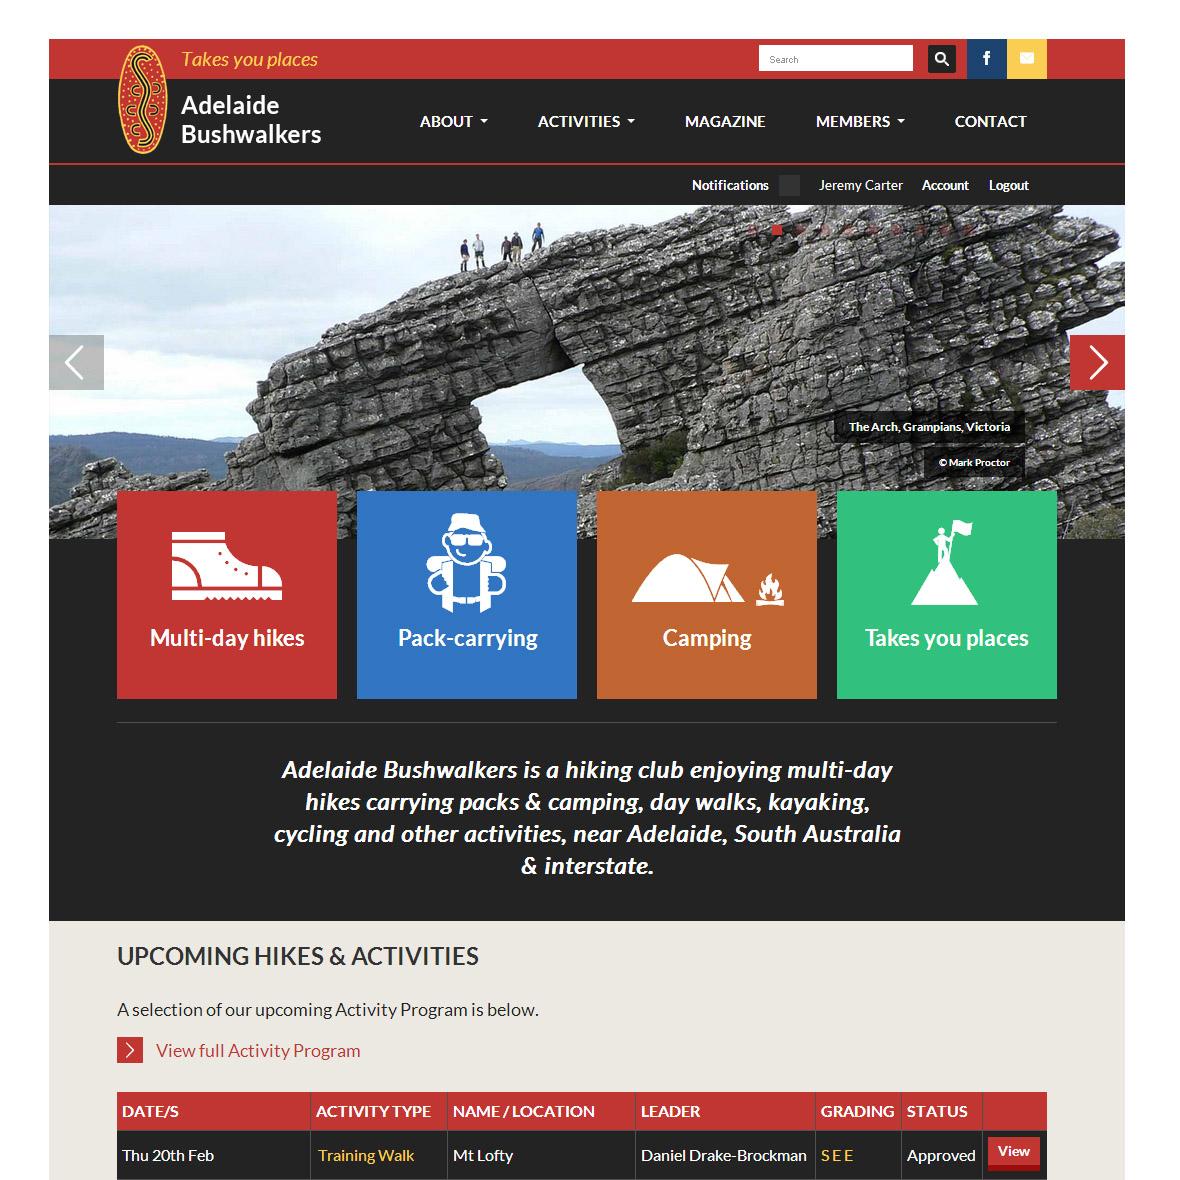 Design highlights key points of differences for Adelaide Bushwalkers